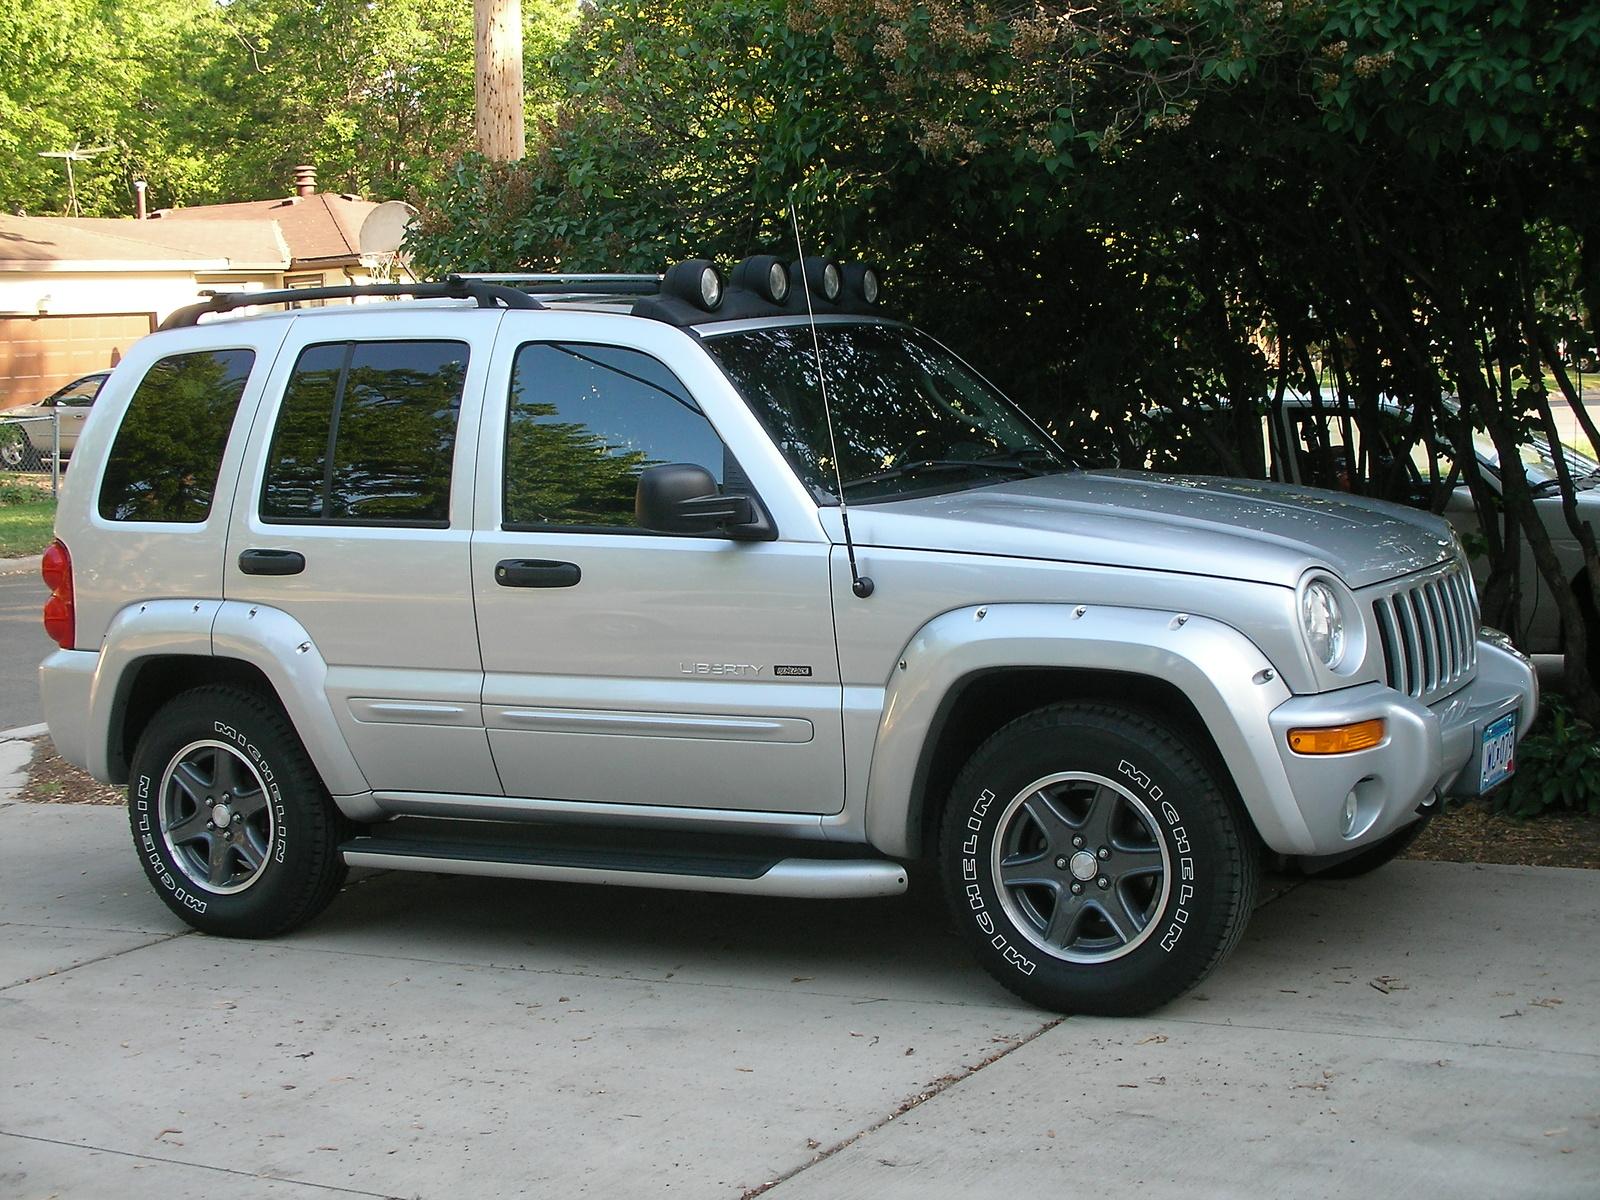 2002 Jeep Liberty #7 Jeep Liberty #7